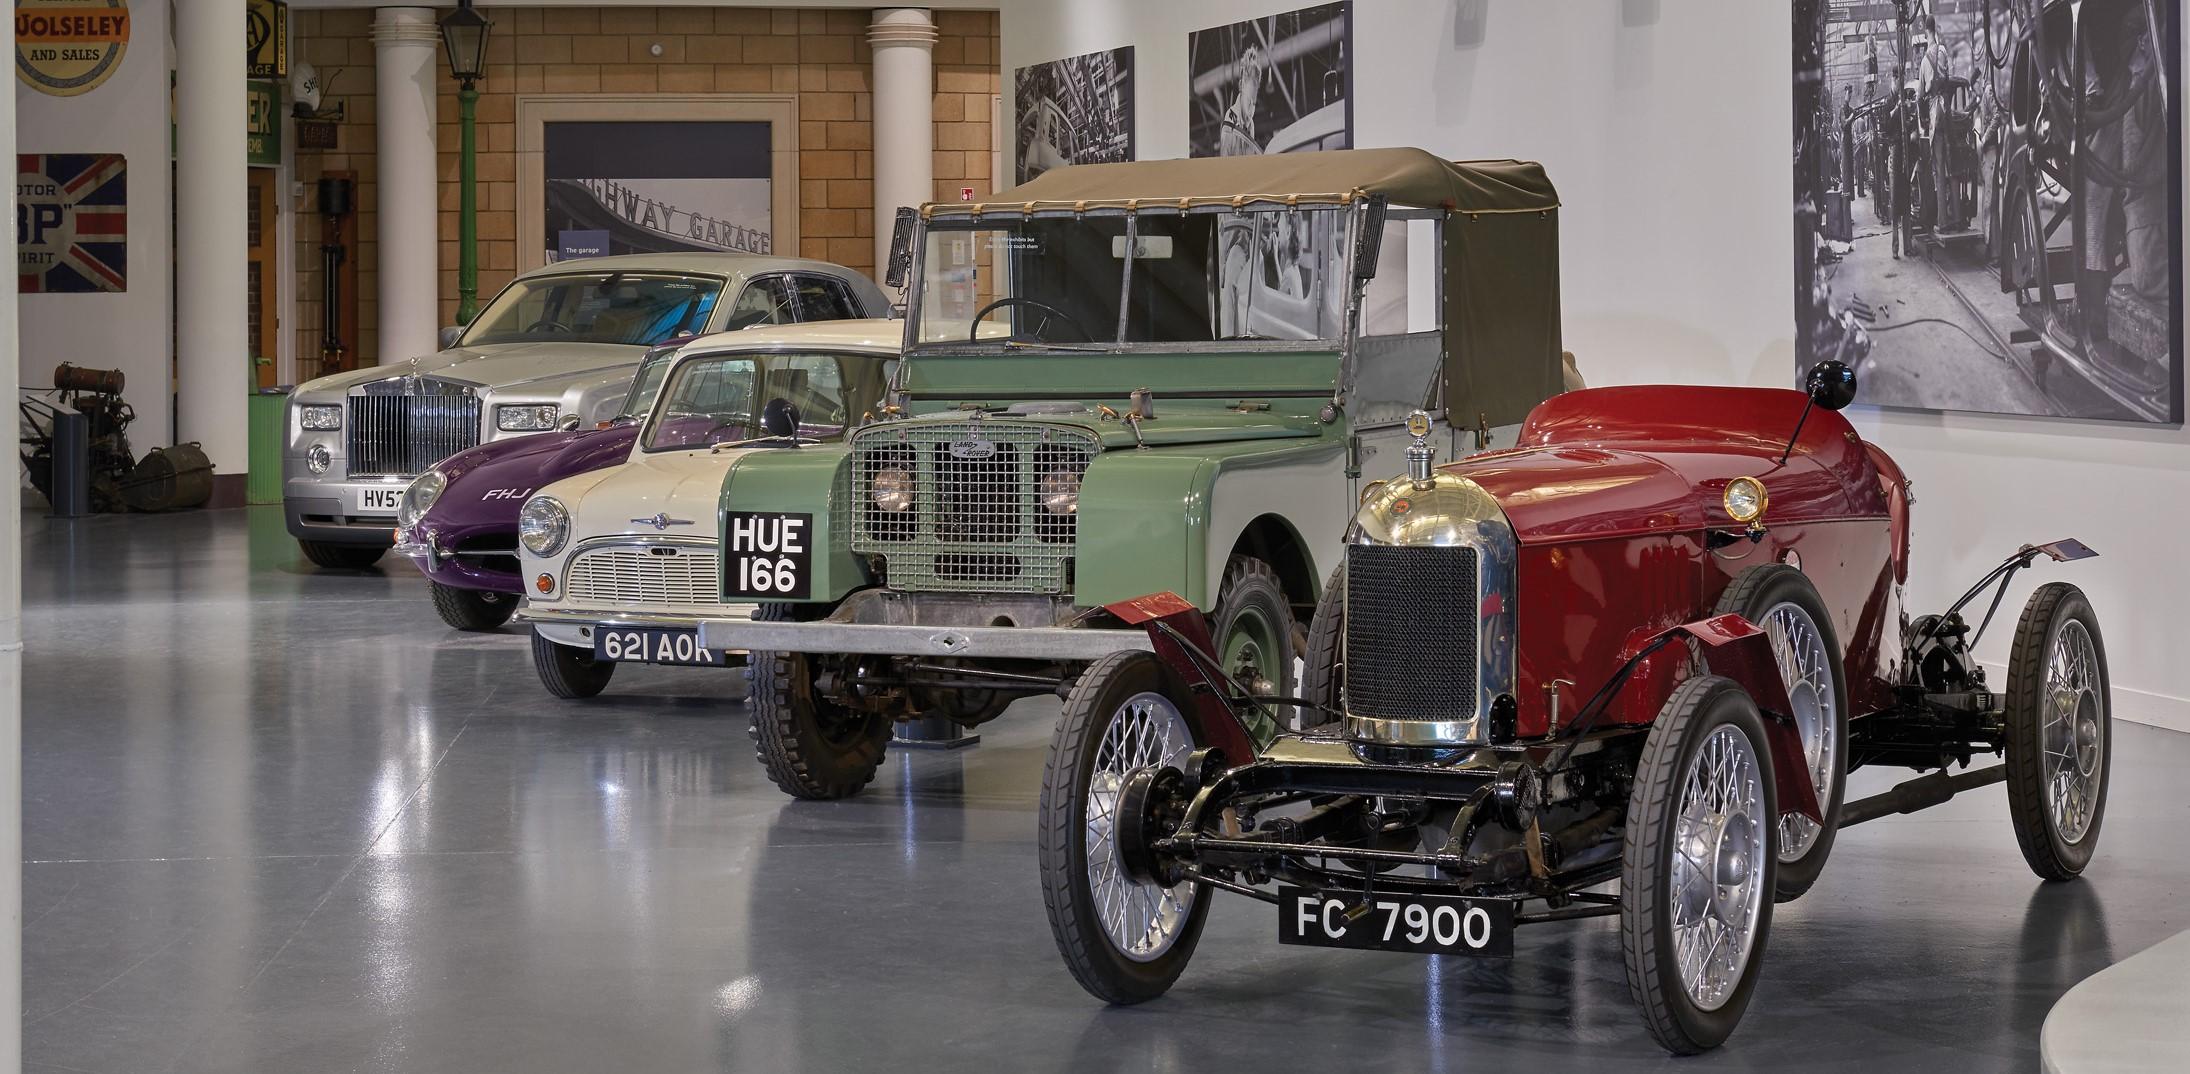 British Motor Museum - Welcome Gallery